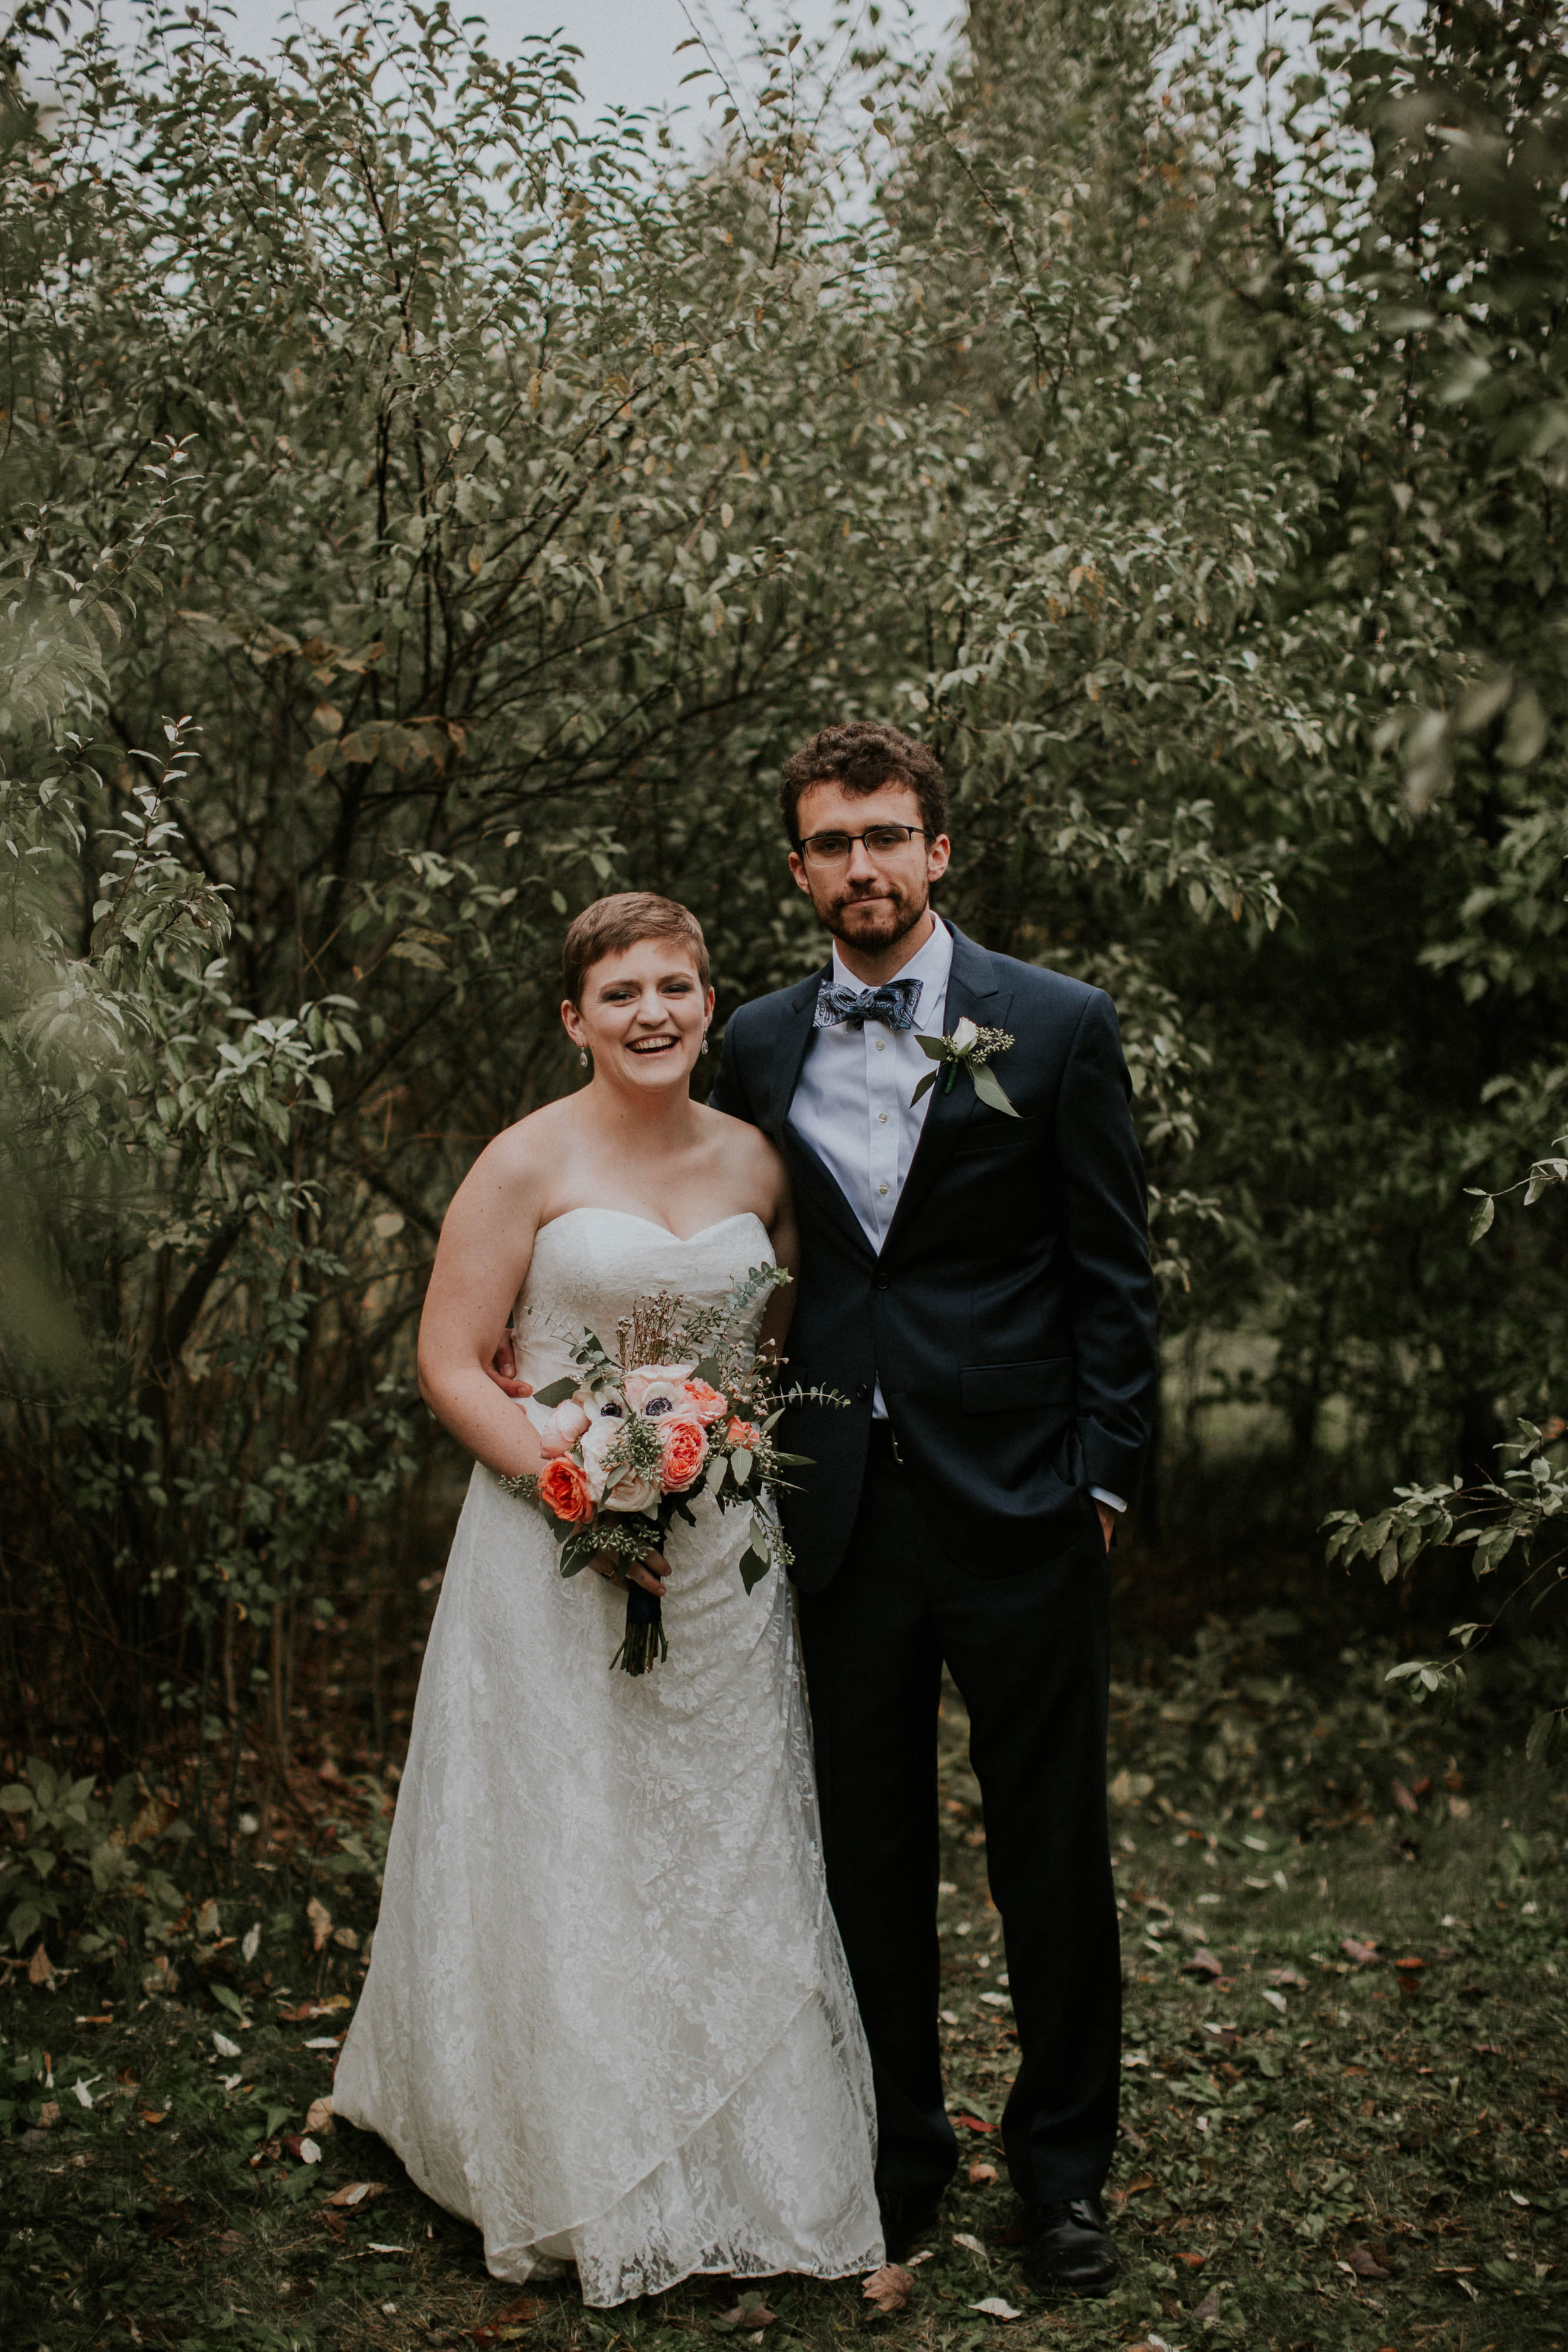 Columbus ohio wedding photographer grace e jones photography real fun joyful wedding18.jpg